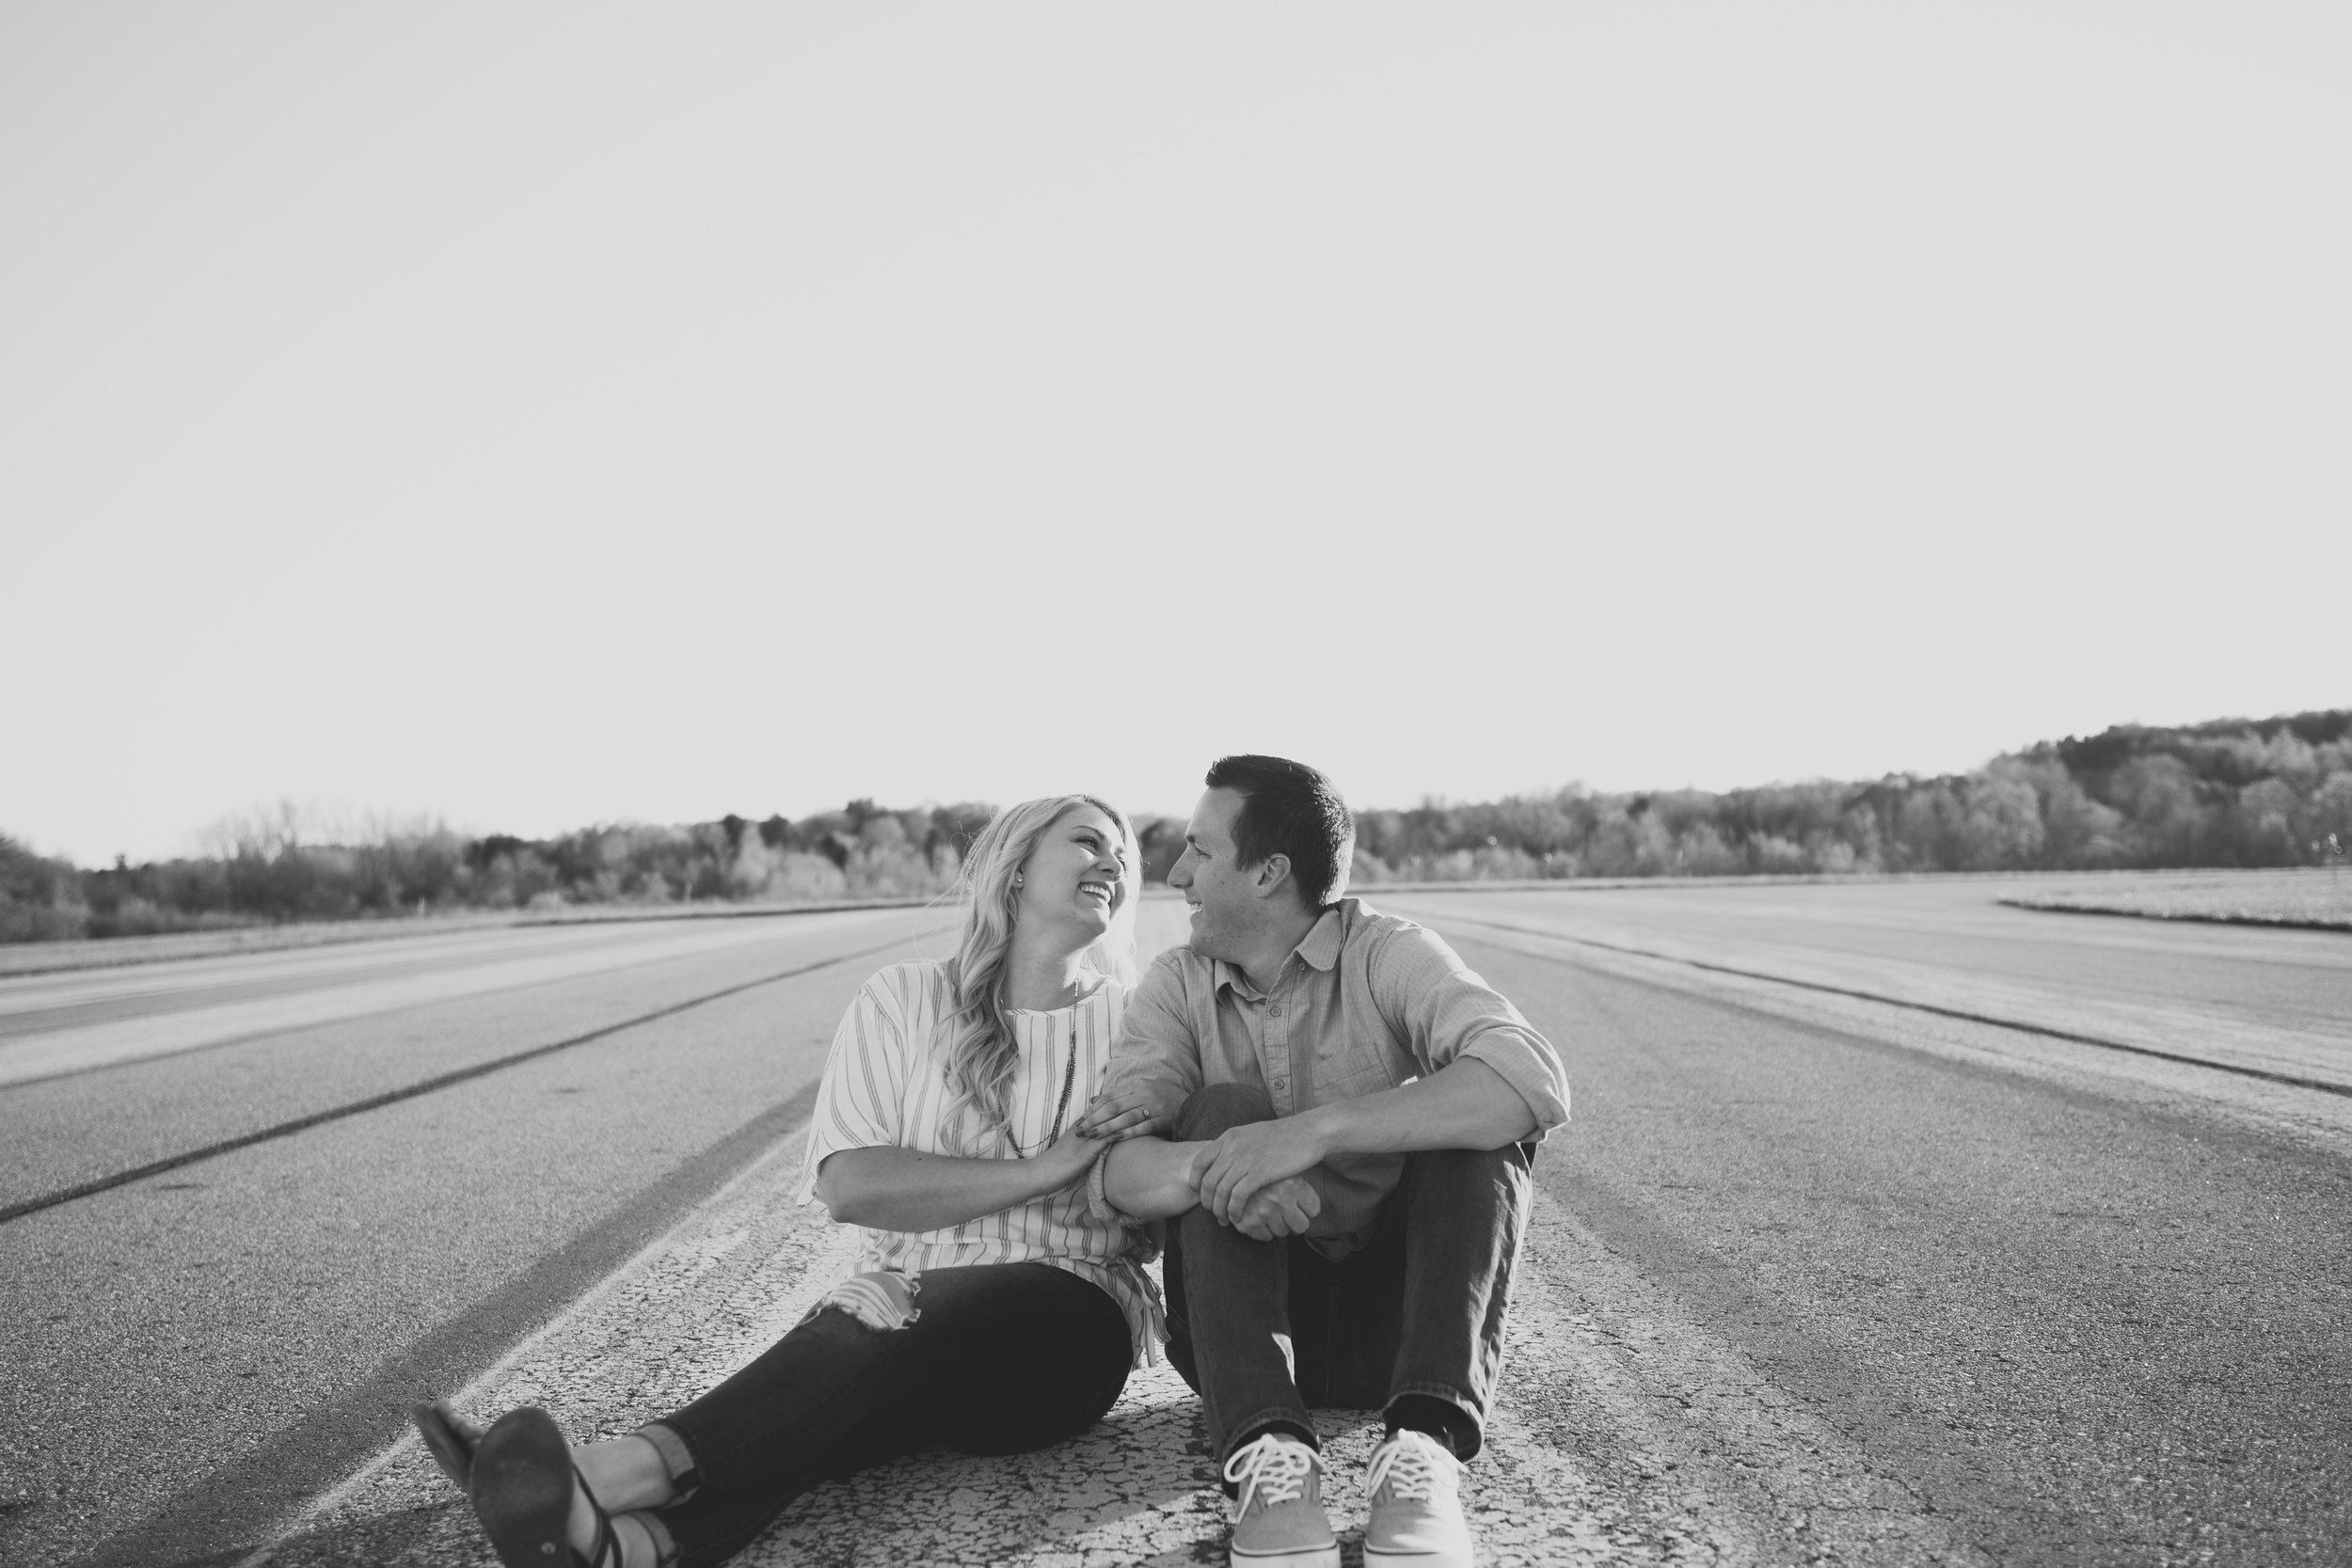 Grand Rapids Photographer - J Darling Photo - jessica darling - grand rapids wedding photographer - sparta airport - sparta michigan - jasmine and jeff engaged 044.jpg